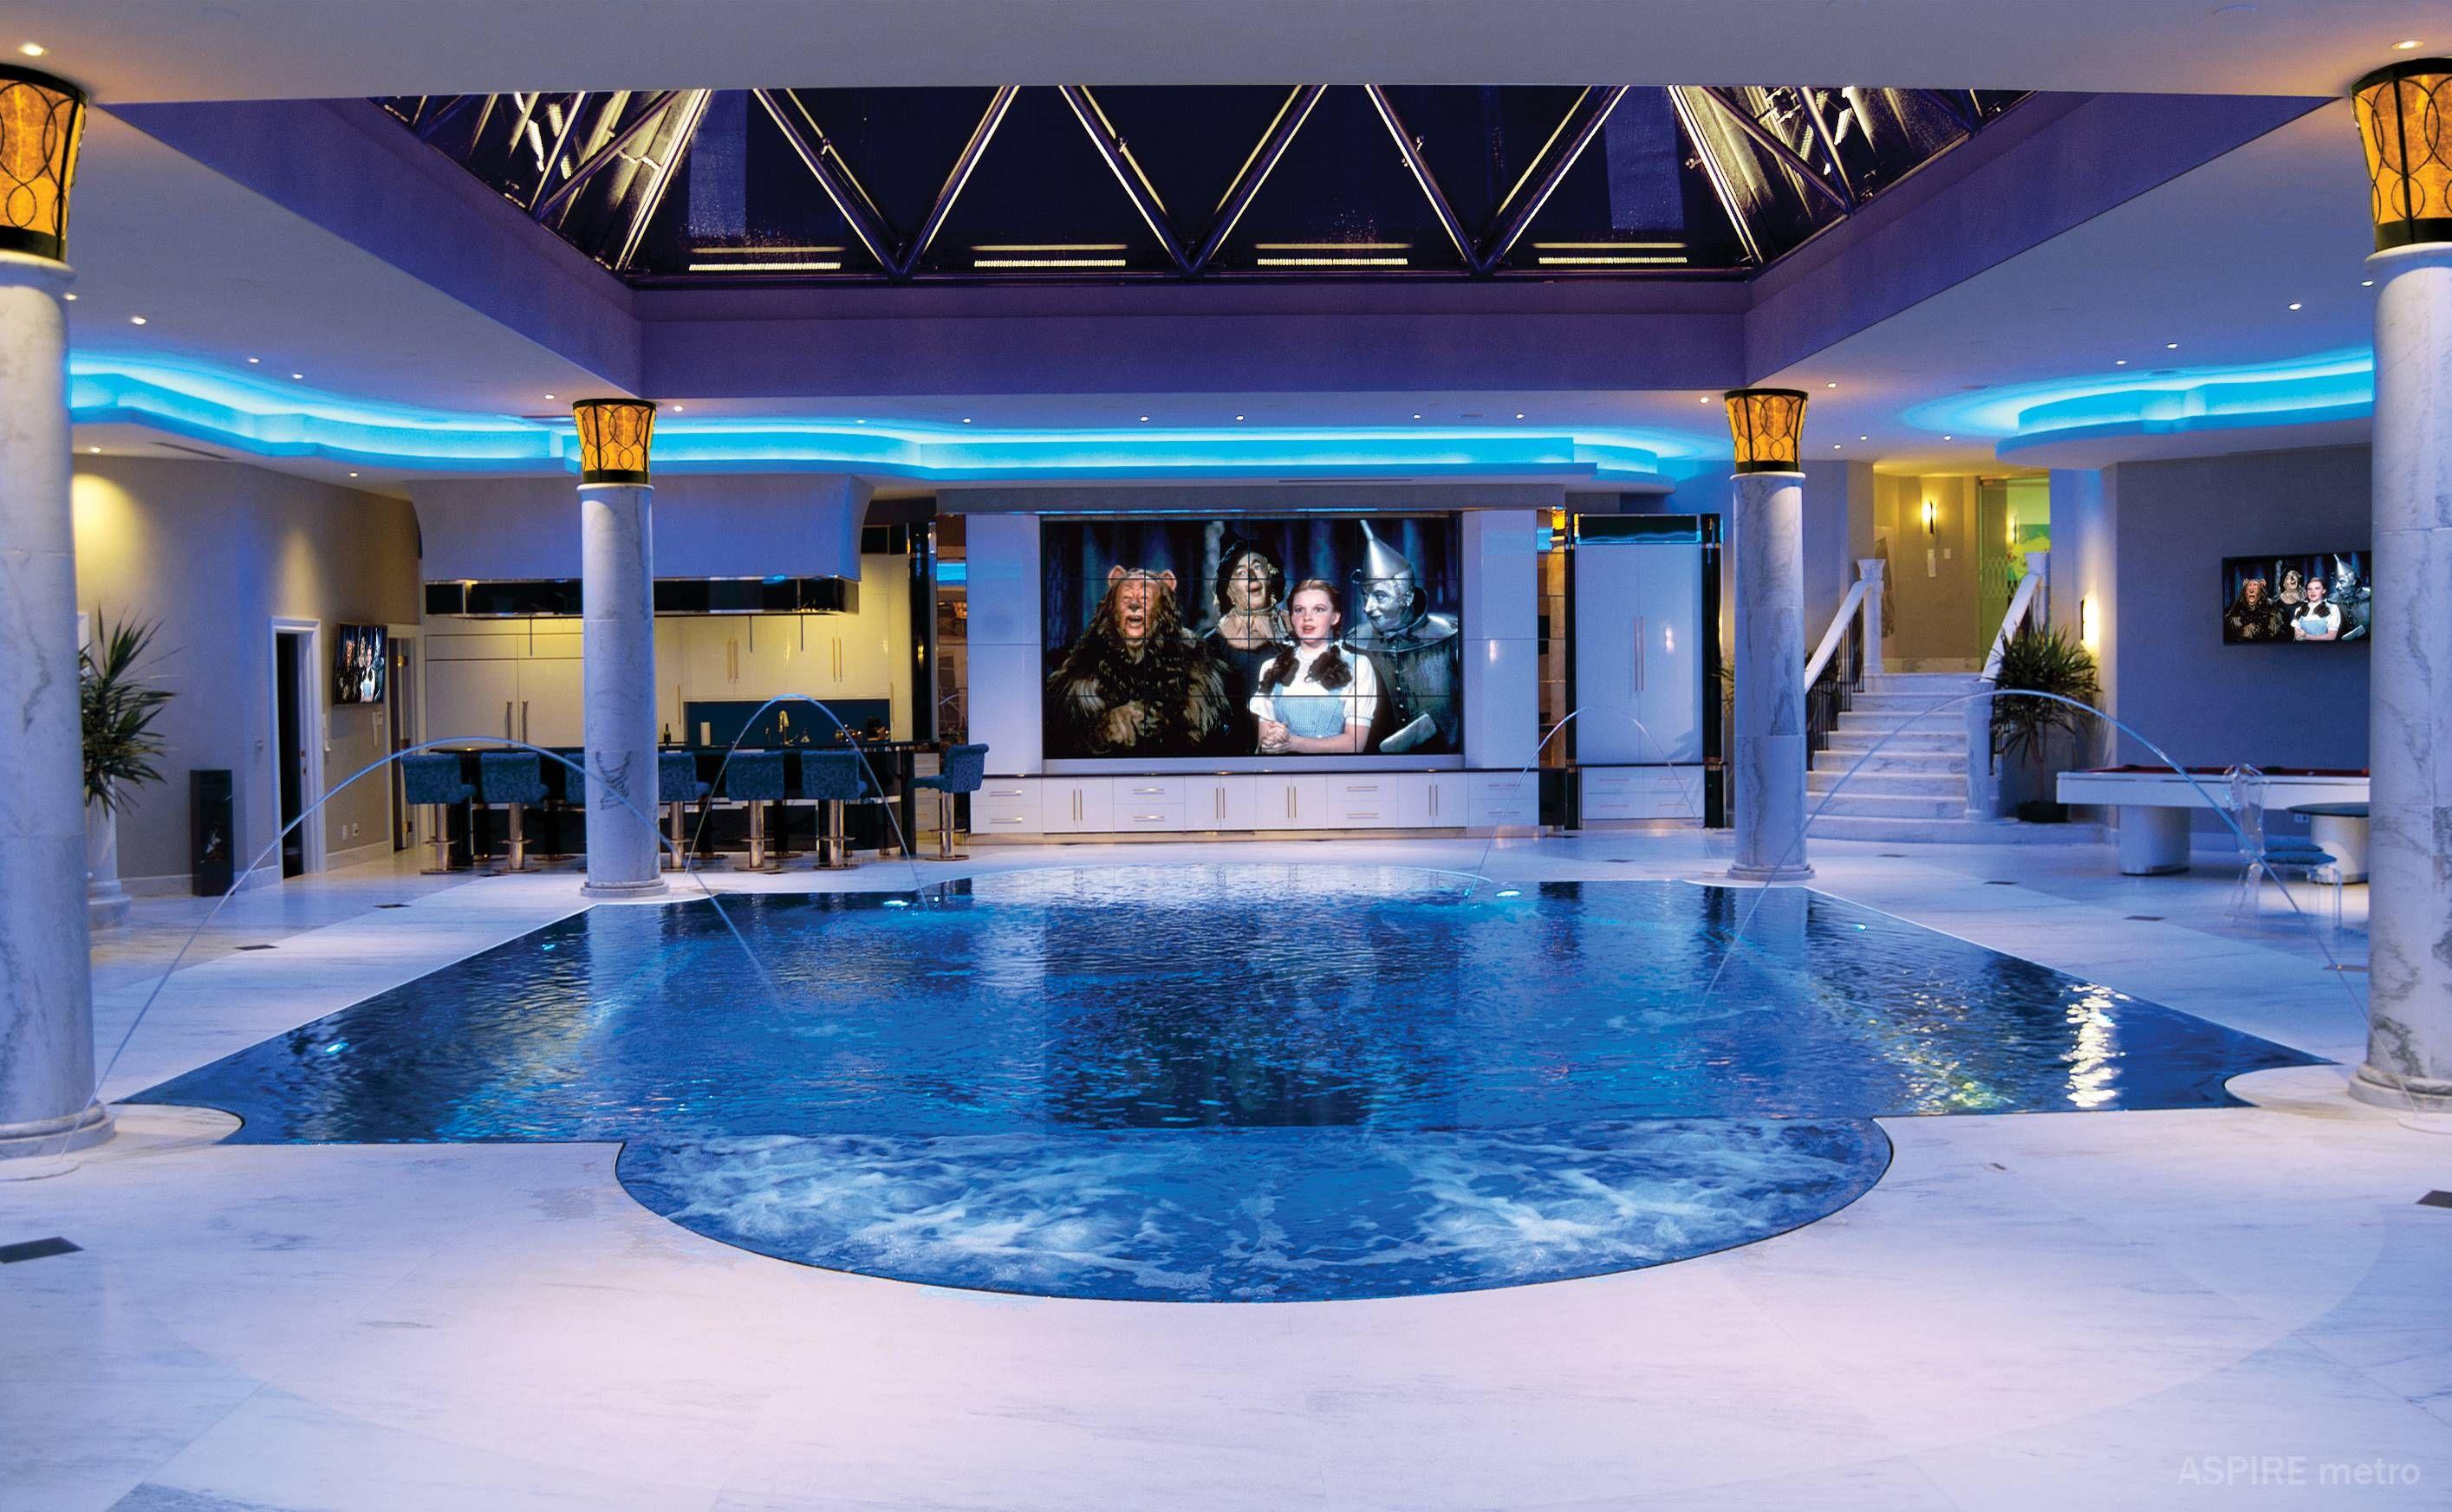 8 Cozy And Cool Indoor Pool Rooms Indoor Pool Design Indoor Pool House Indoor Swimming Pools